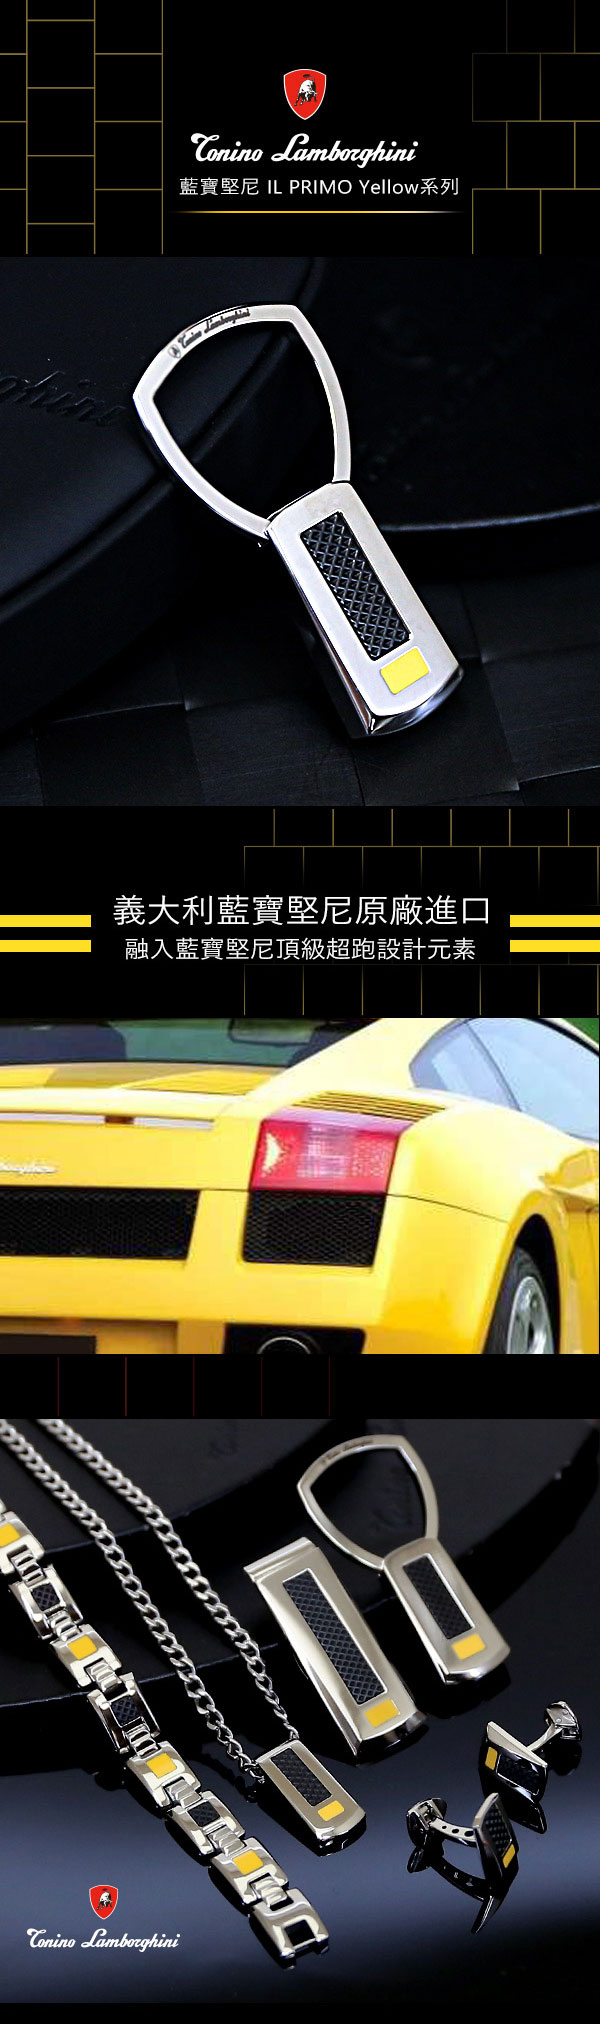 (複製)藍寶堅尼Lamborghini |IL PRIMO Yellow |手鍊